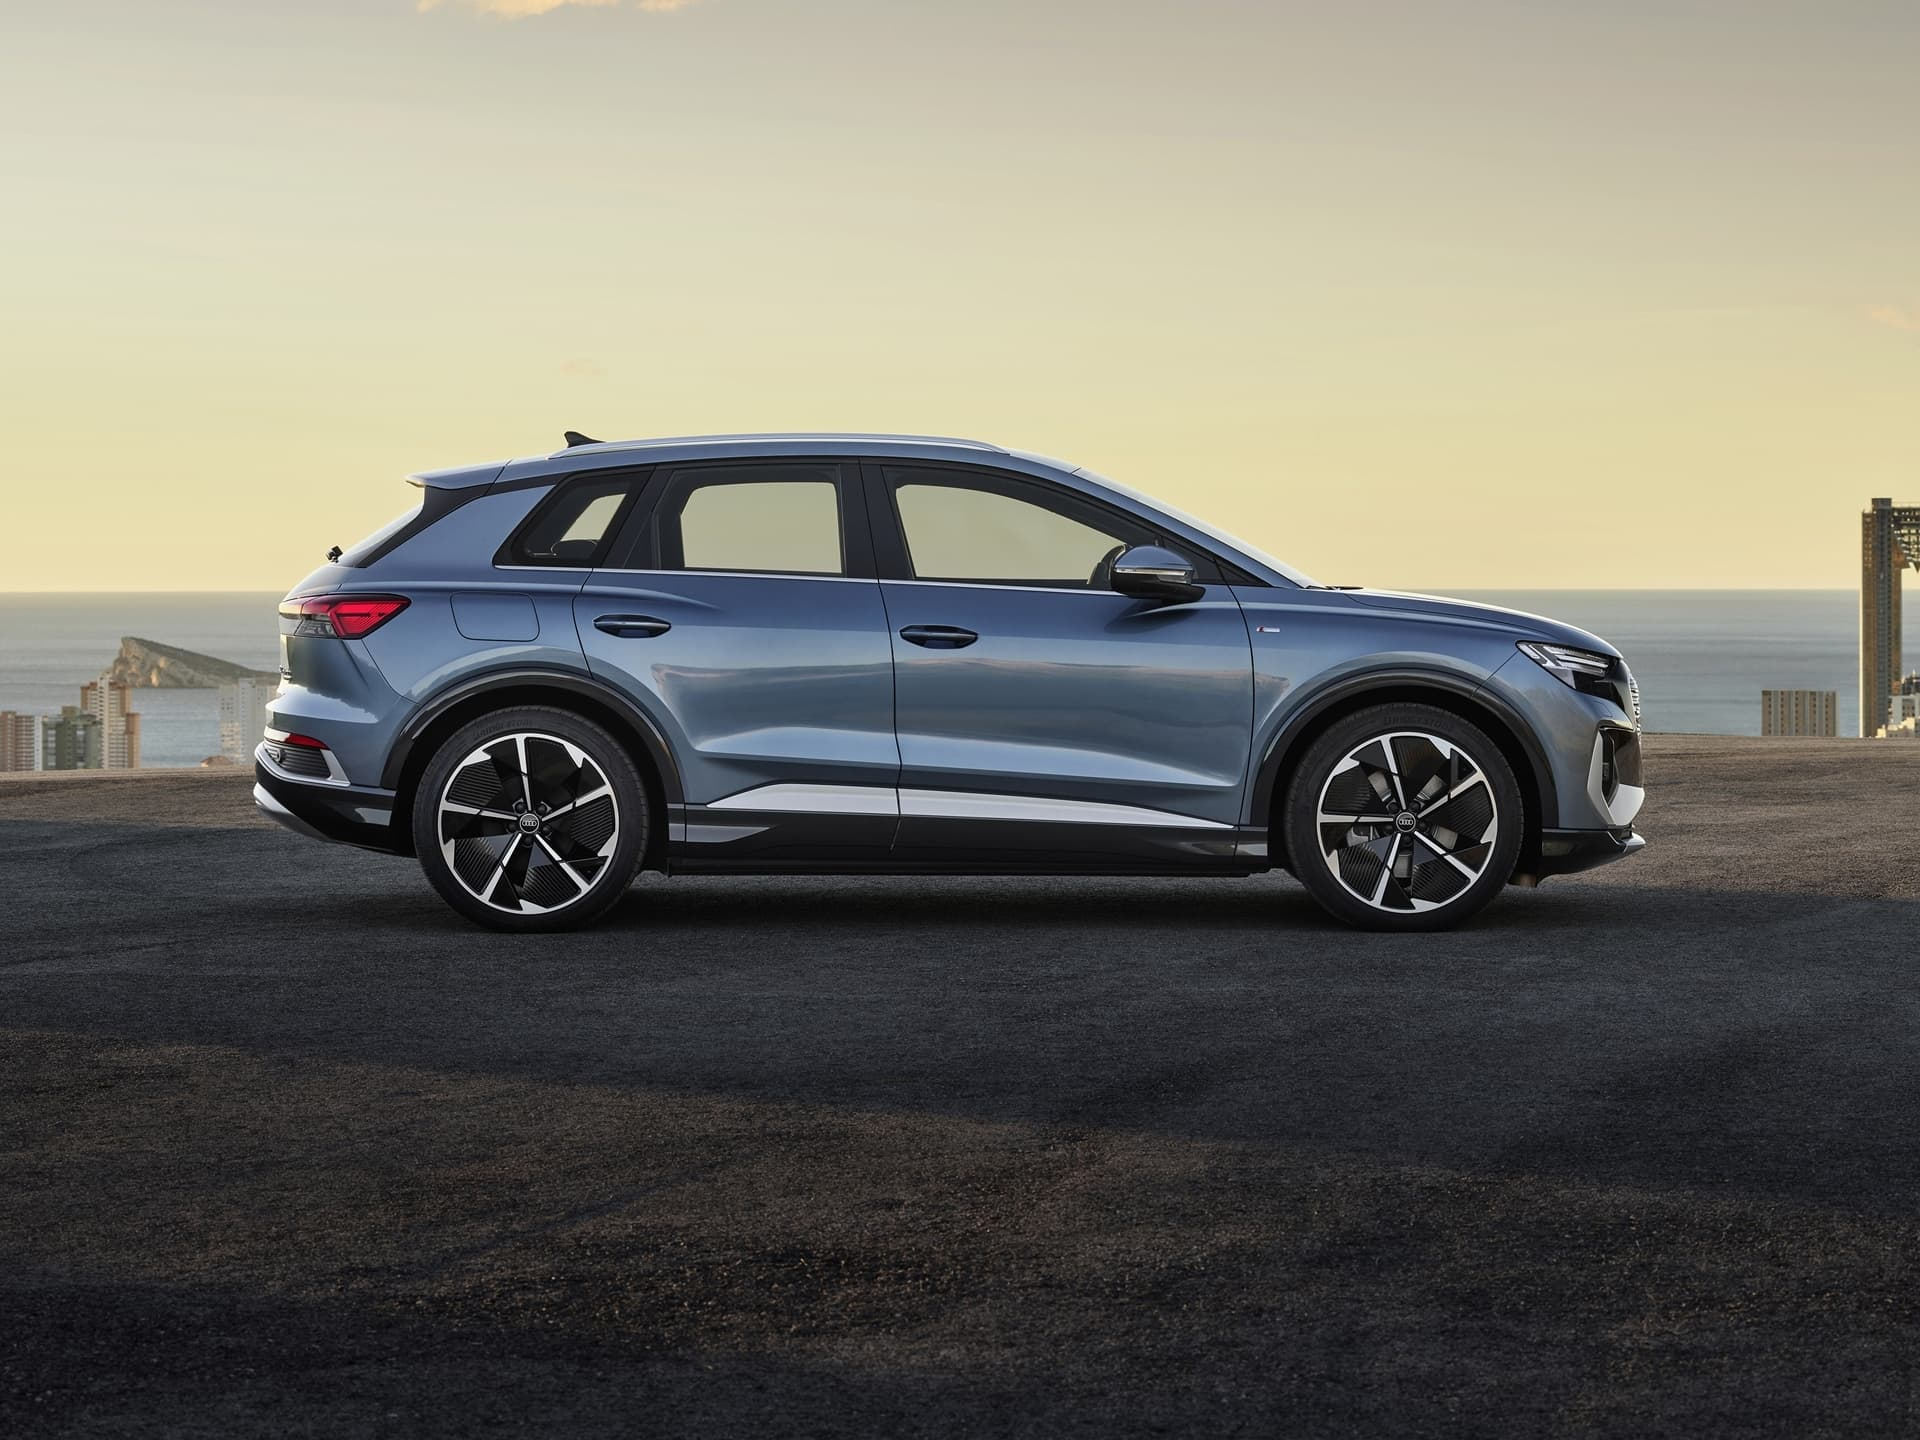 Audi Q4 E Tron 2021 Azul Lateral 036